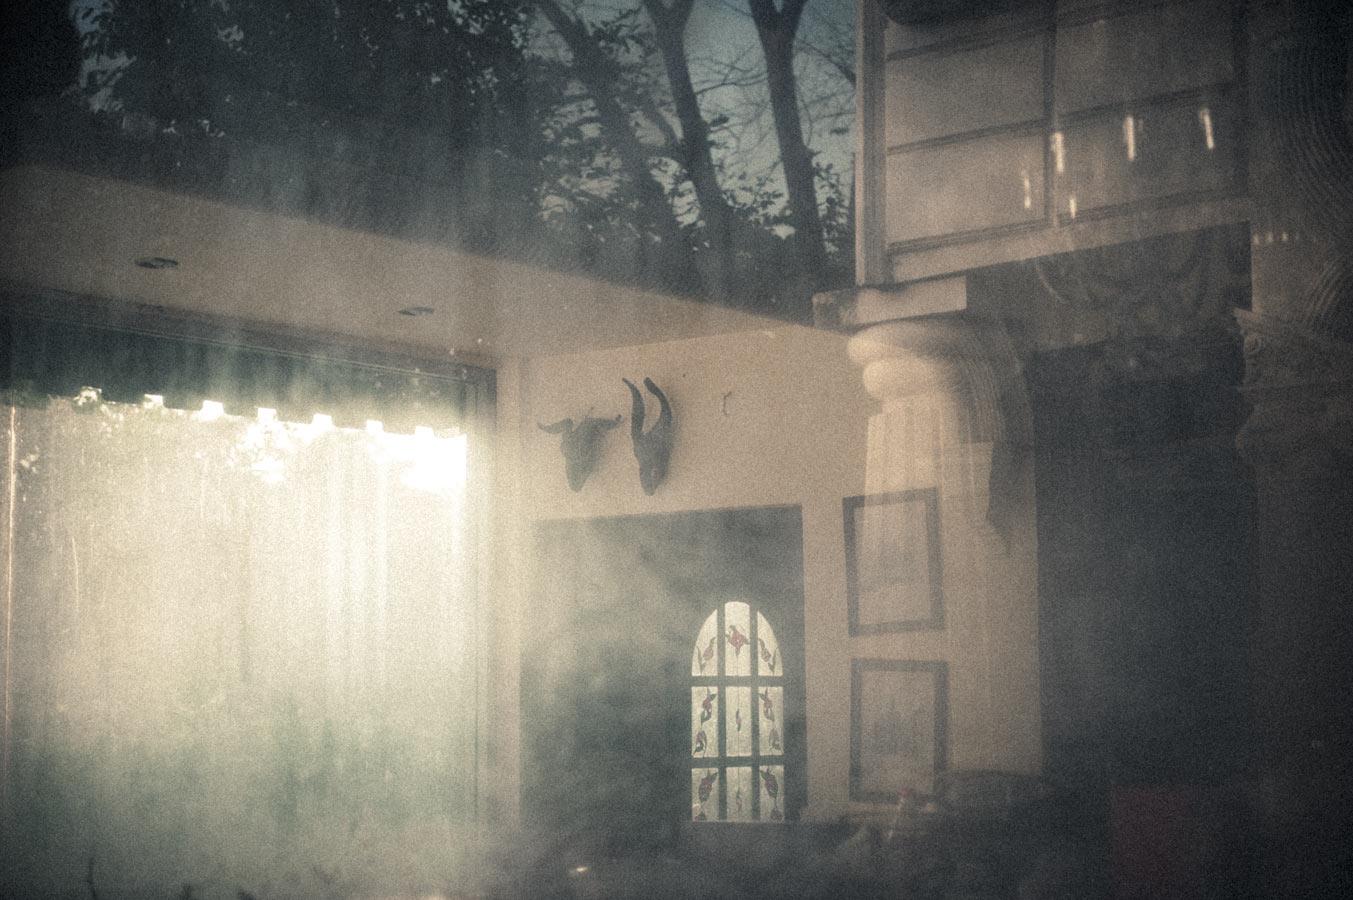 Jamie-Lowe-Photography-Haunted-House-Chiang-Mai-67.jpg